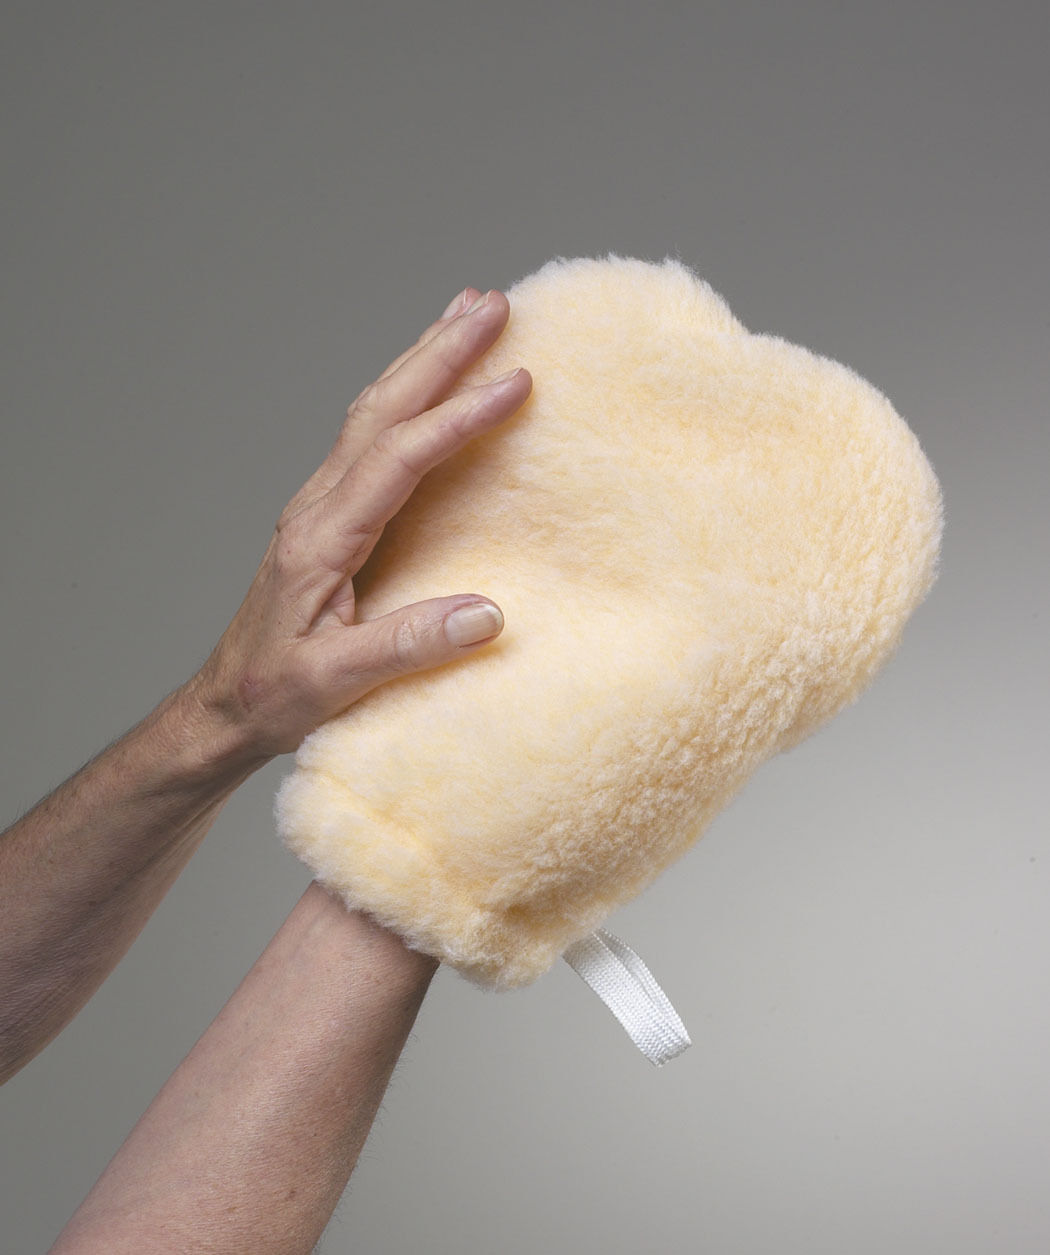 как выглядит Skil-Care Bath Mitt Home Health Caregiver Soft Thorough Clean Reusable 913030 фото